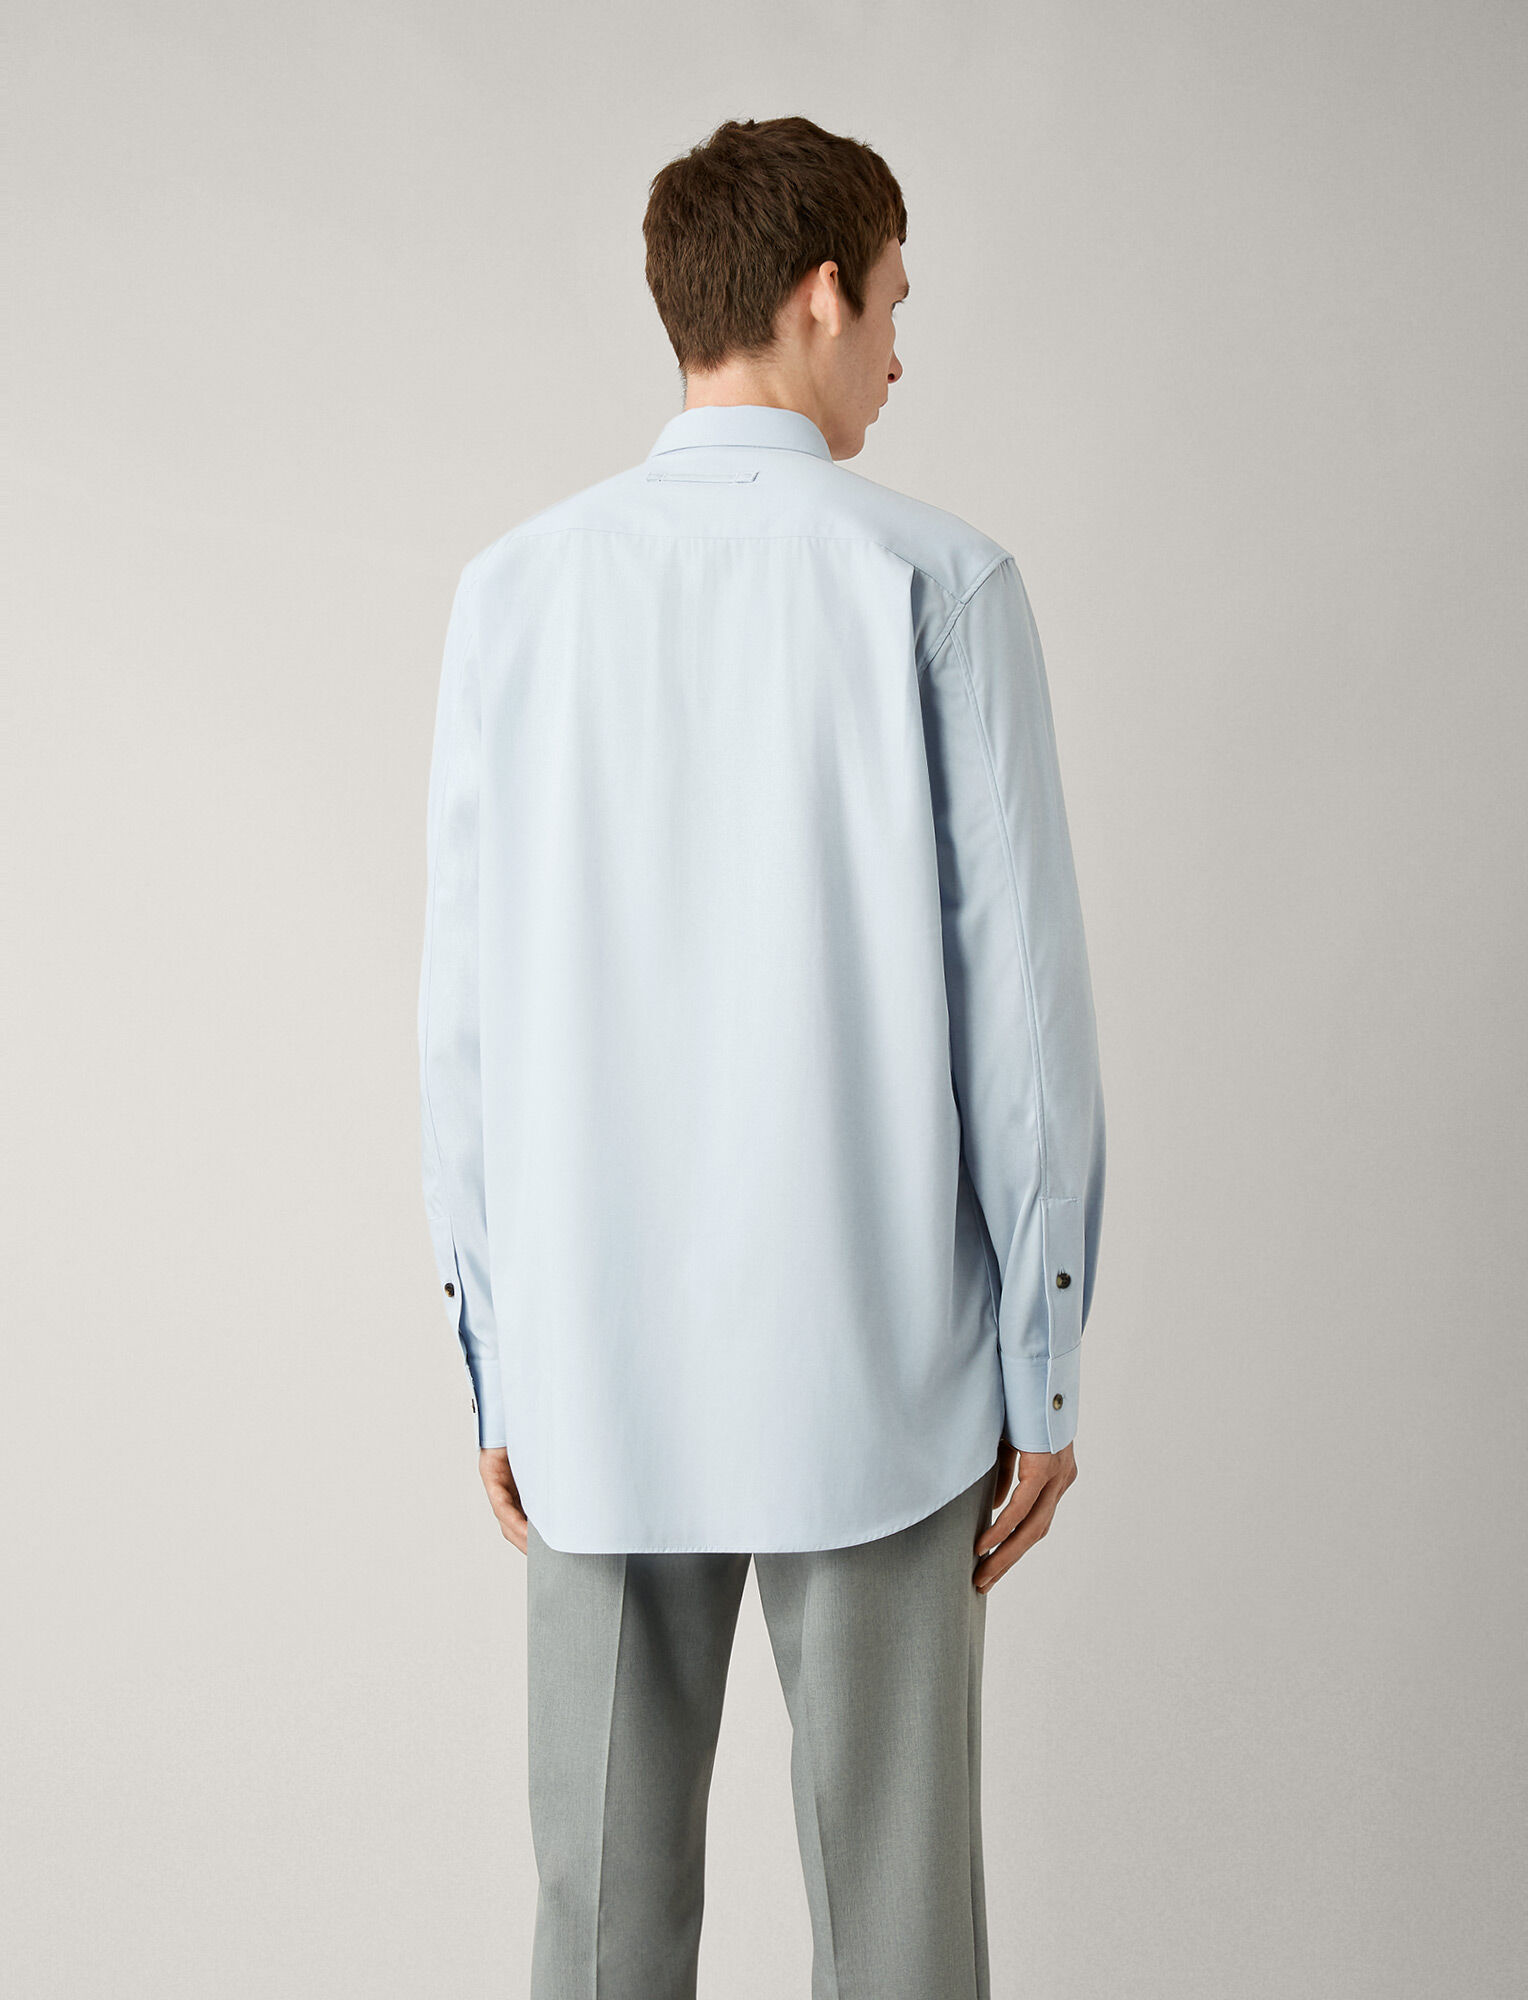 Joseph, Joseph Cotton Twill Shirt, in SKY BLUE